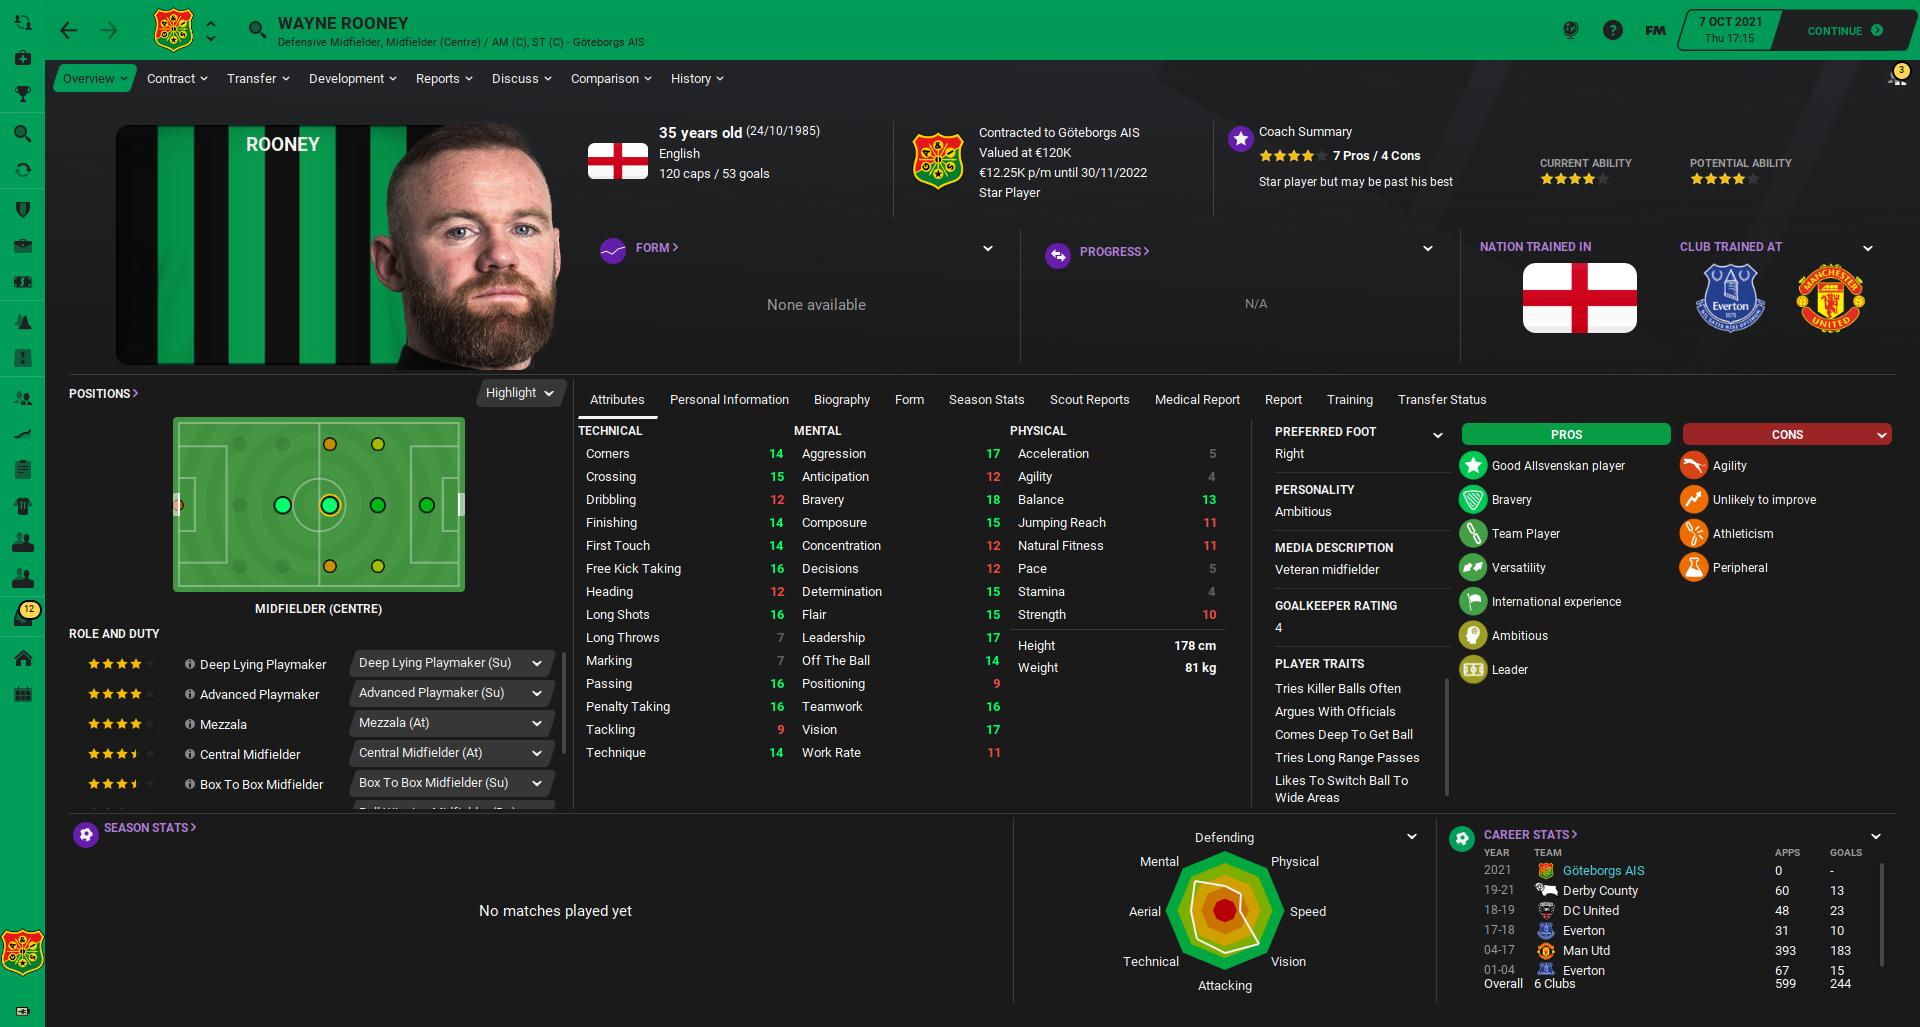 FM21 | Wayne Rooney: Keeping the biggest star fit